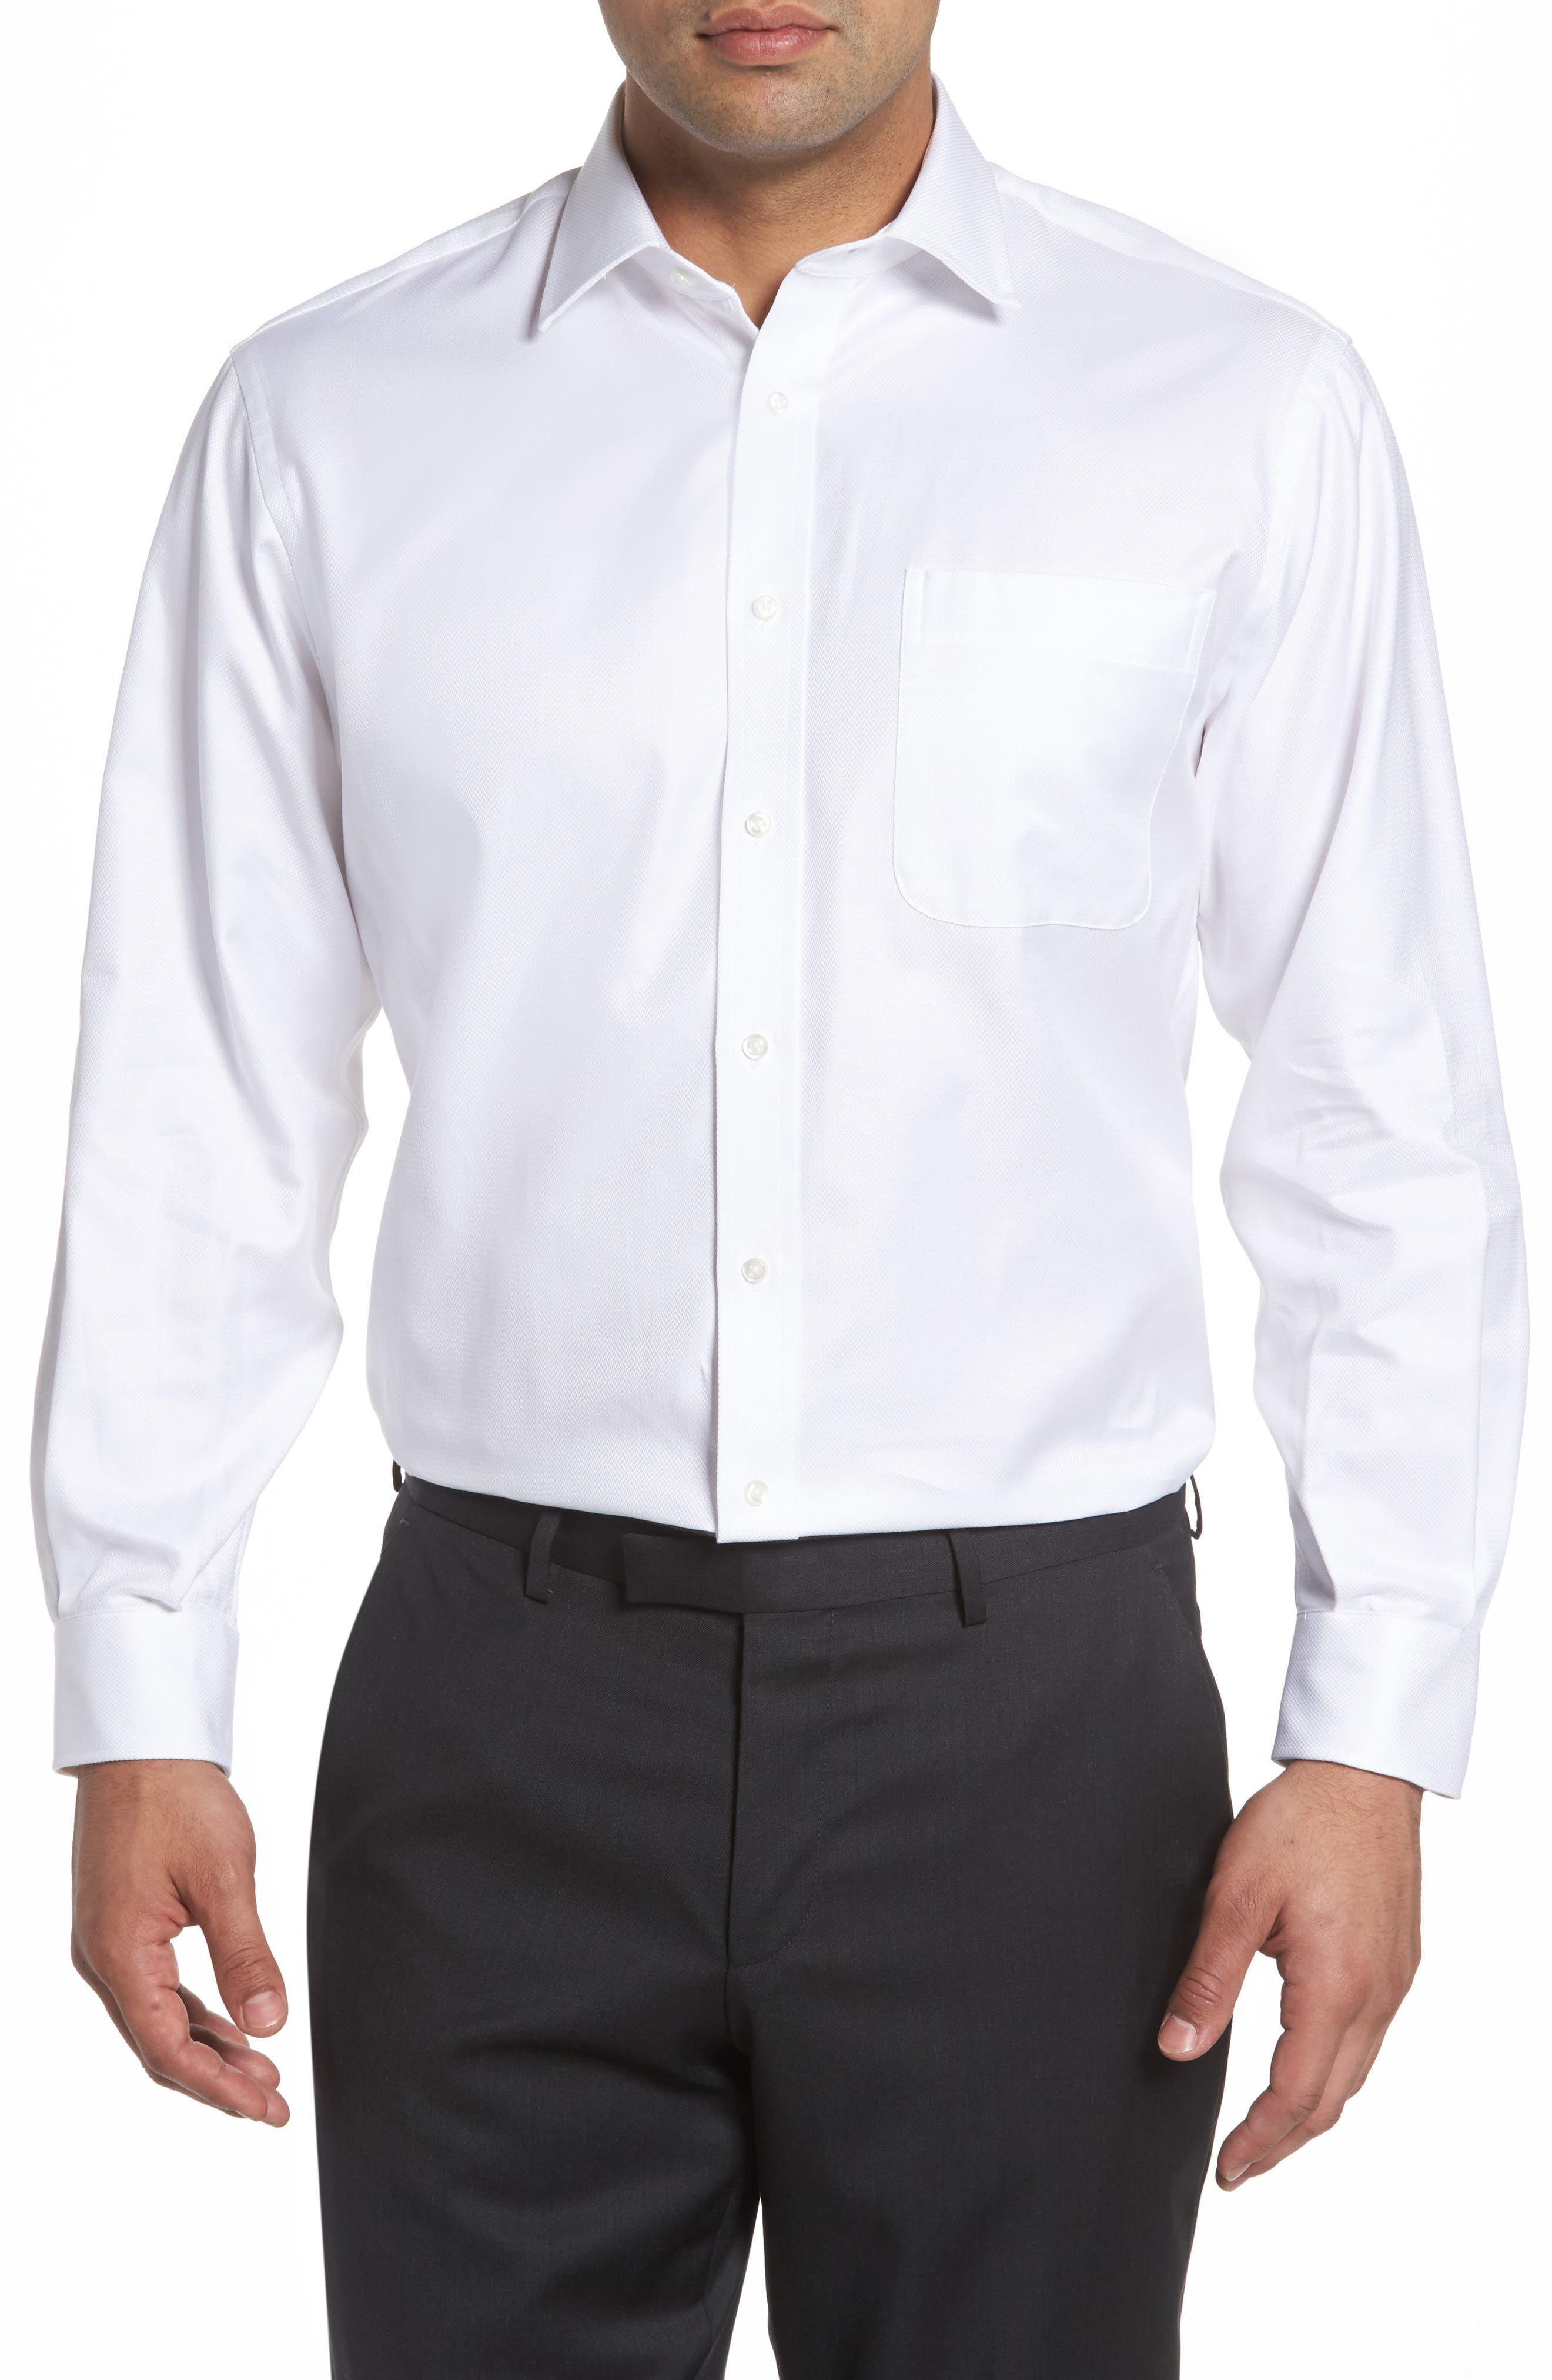 Nordstrom Men's Shop Classic Fit Textured Dress Shirt